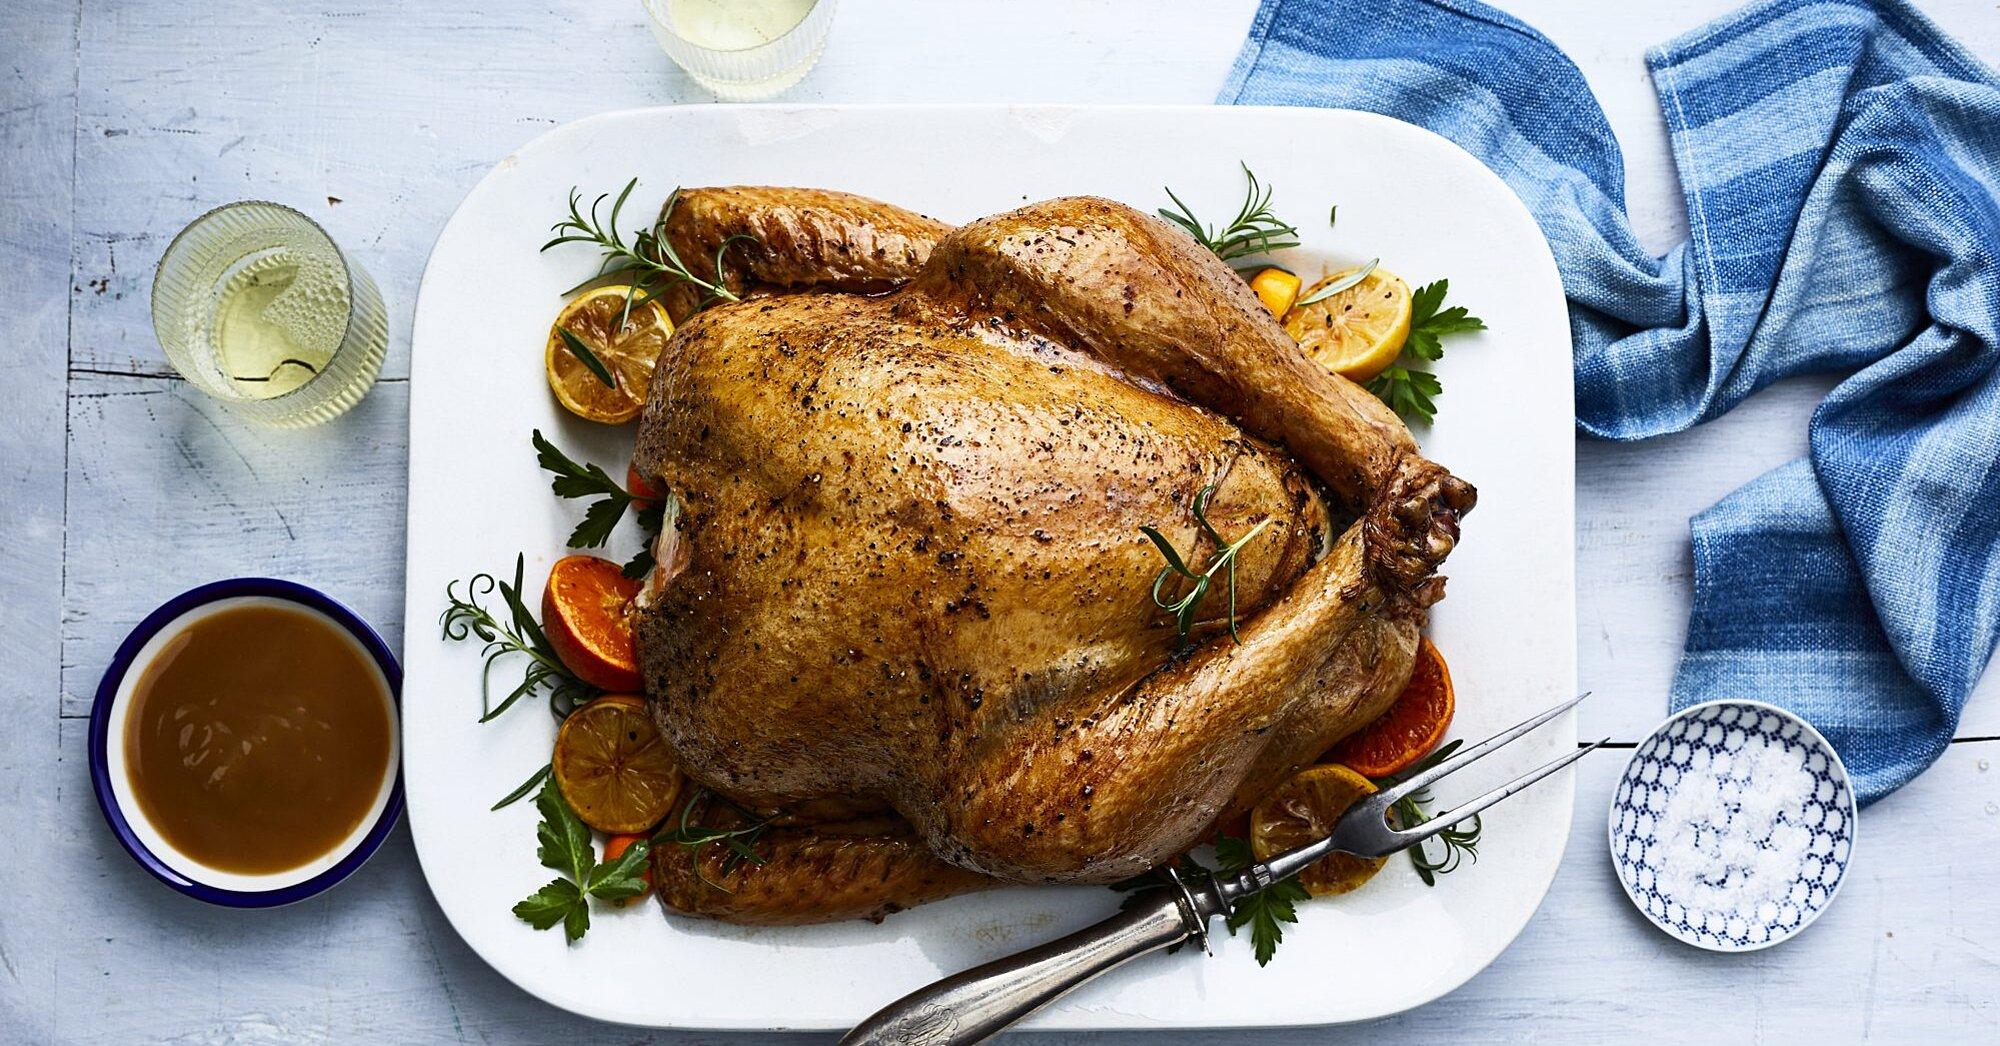 How to Brine a Turkey the Best Way